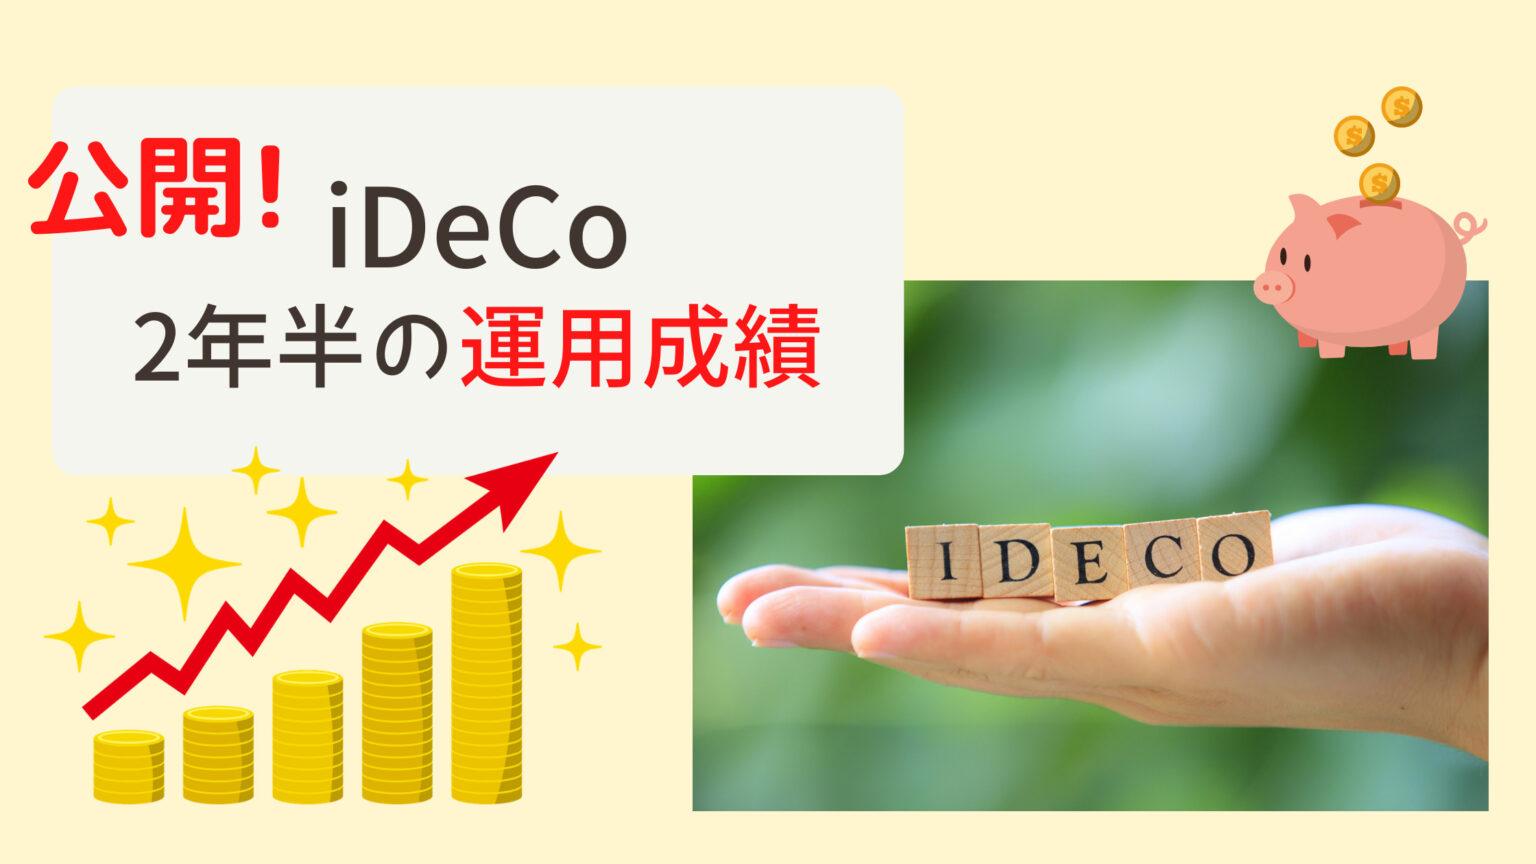 iDeCo イデコ 運用成績 2020年11月 公開 2年半